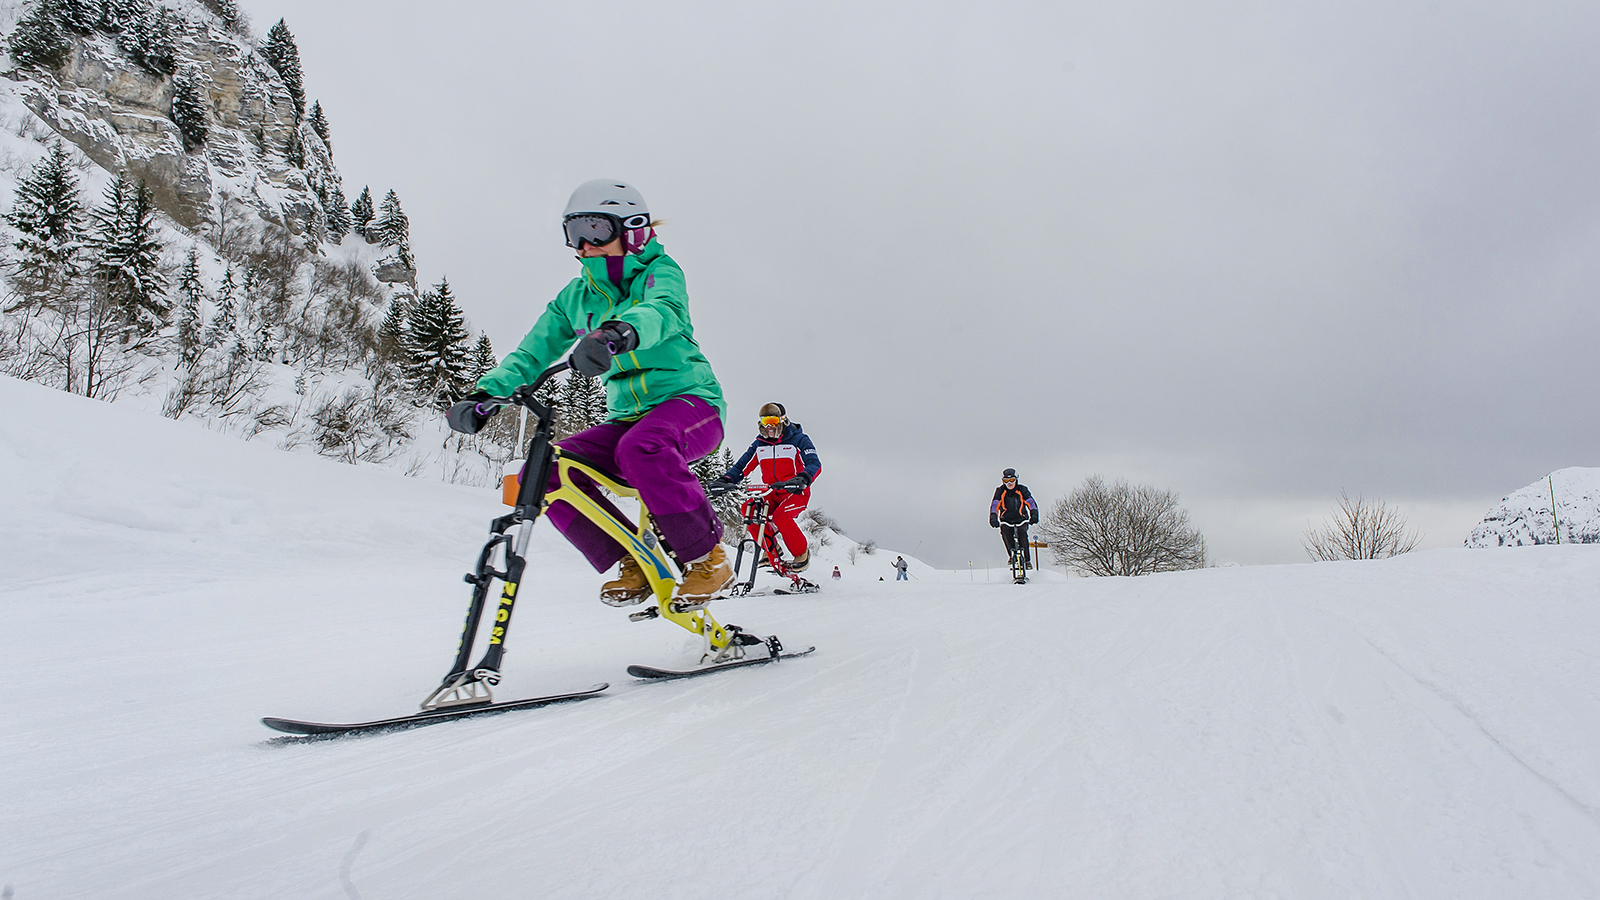 Le Grand Bornand: Unterwegs mit dem Skibike oder véloski. Foto: Hilke Maunder